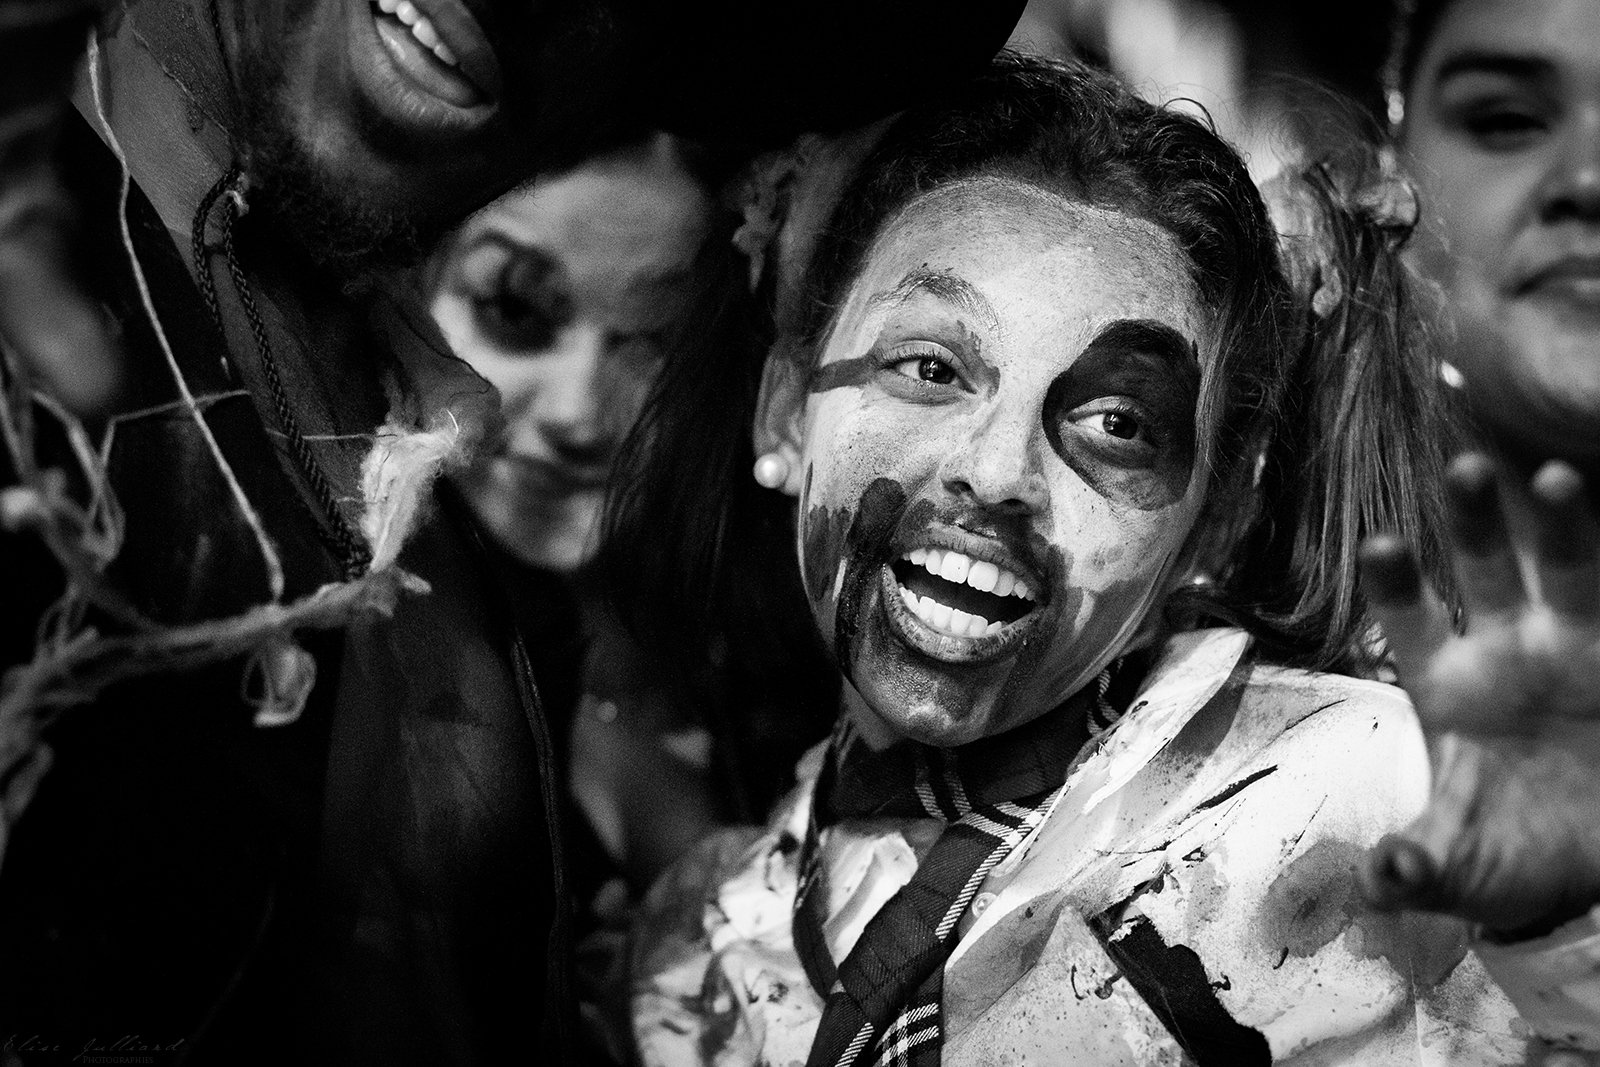 elise-julliard-photographe-photo-new-york-usa-etats-unis-amerique-halloween-6